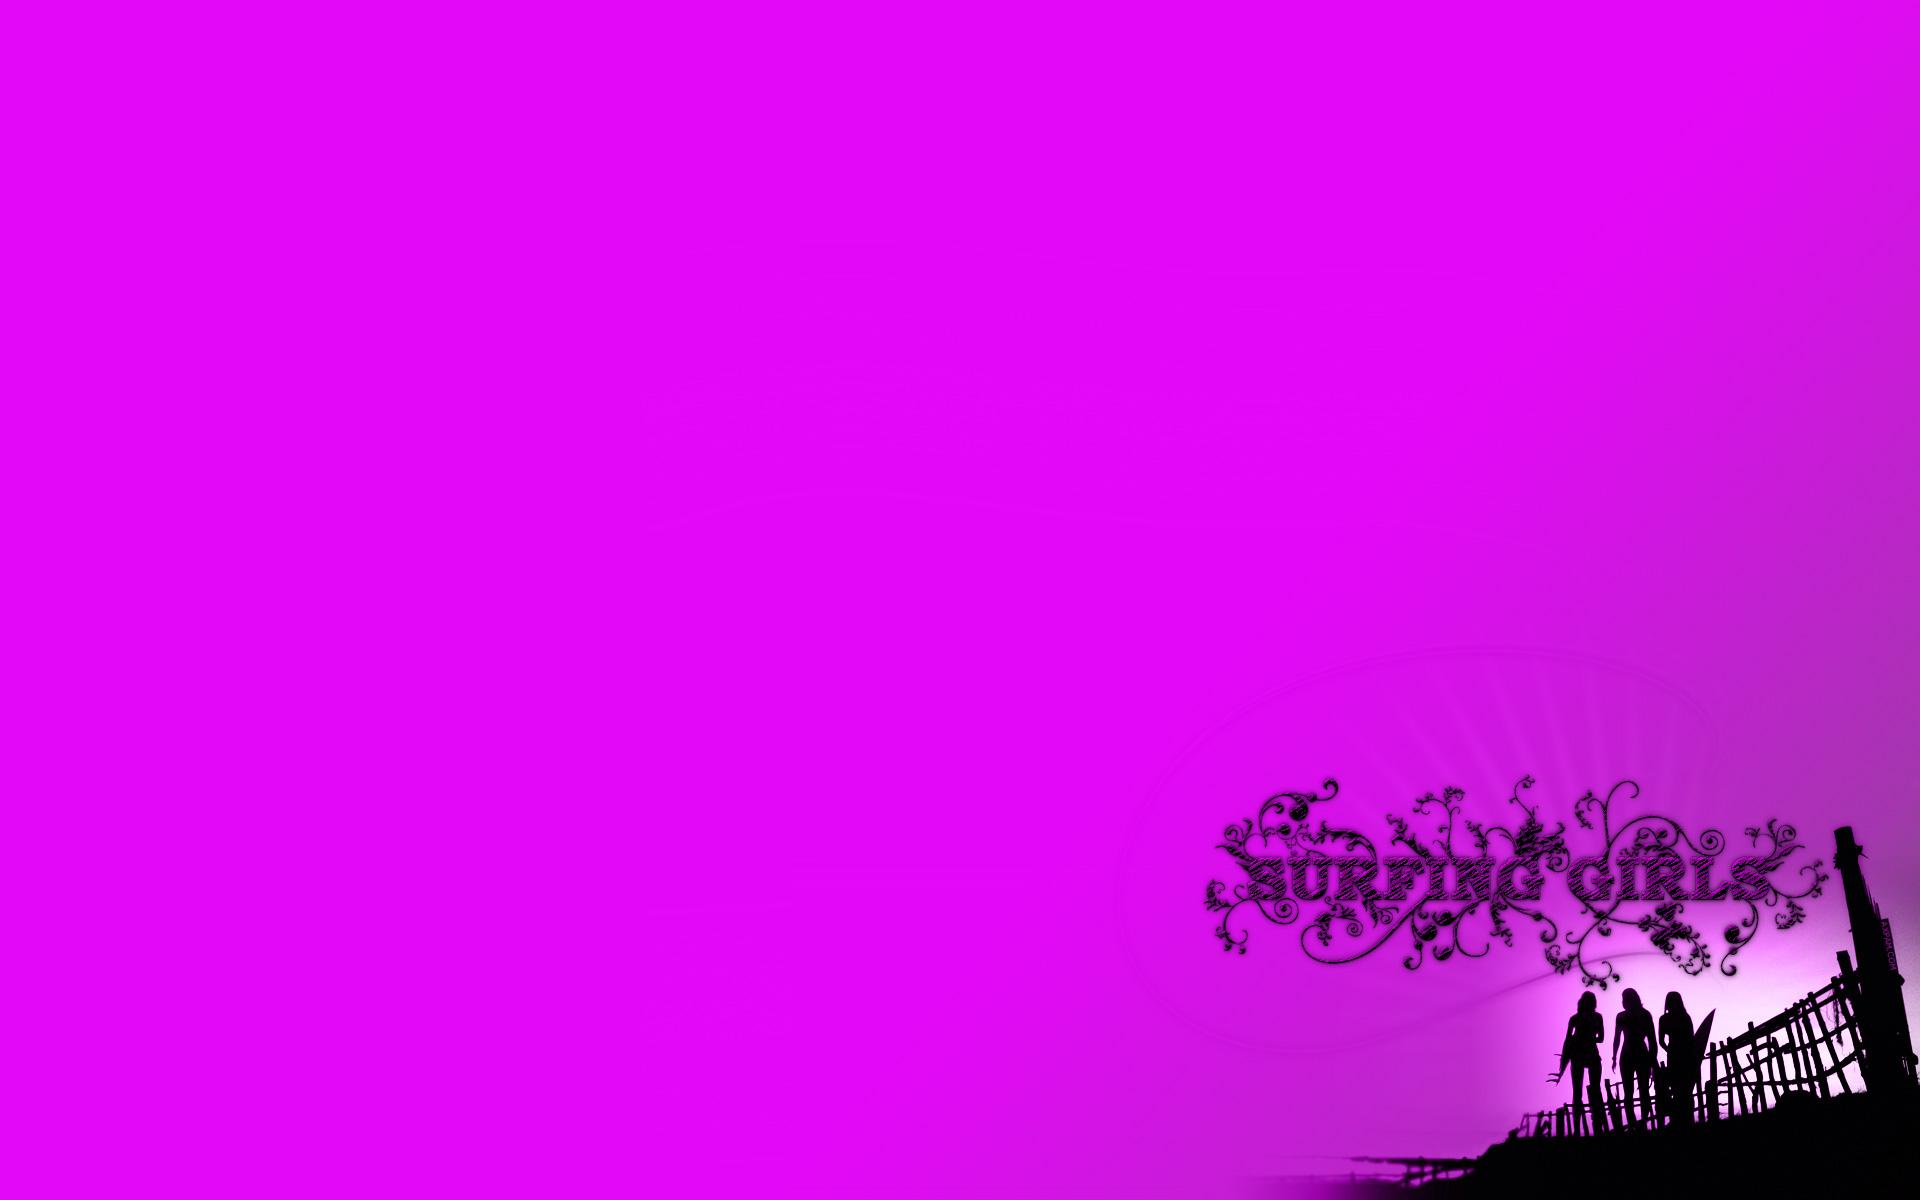 25 Lovely Pink Desktop Wallpapers Best Design Options 1920x1200